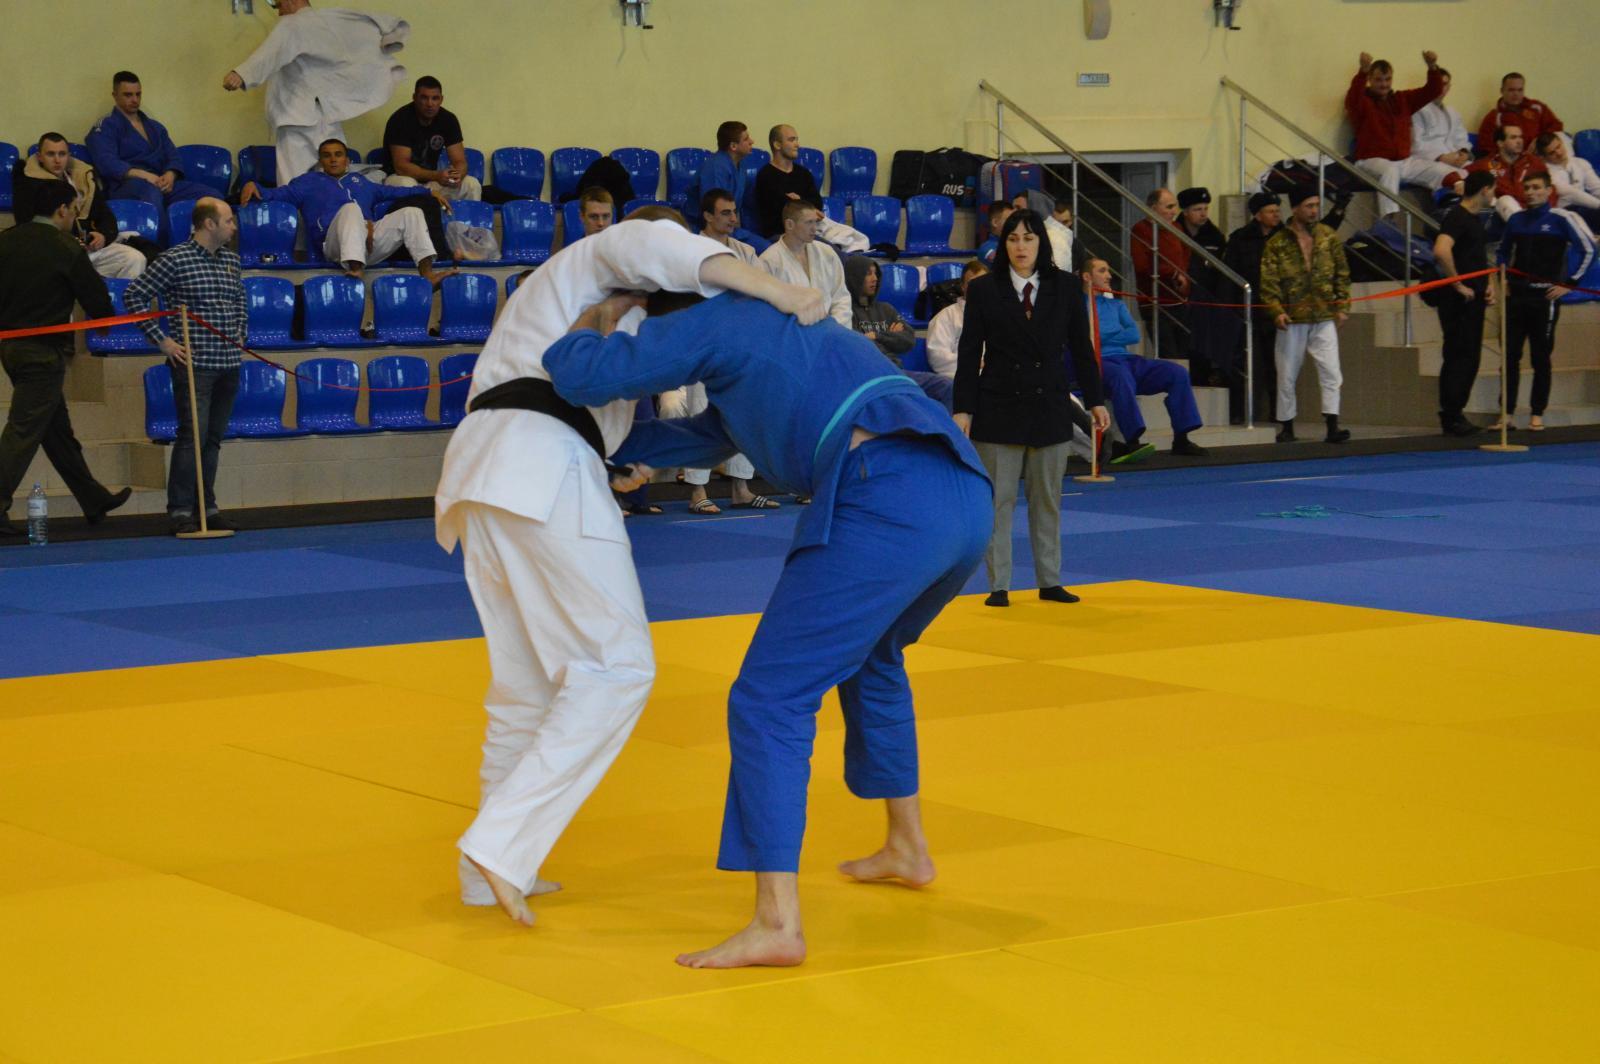 Сотрудники Росгвардии со всего ЦФО приехали в Брянск на чемпионат по дзюдо